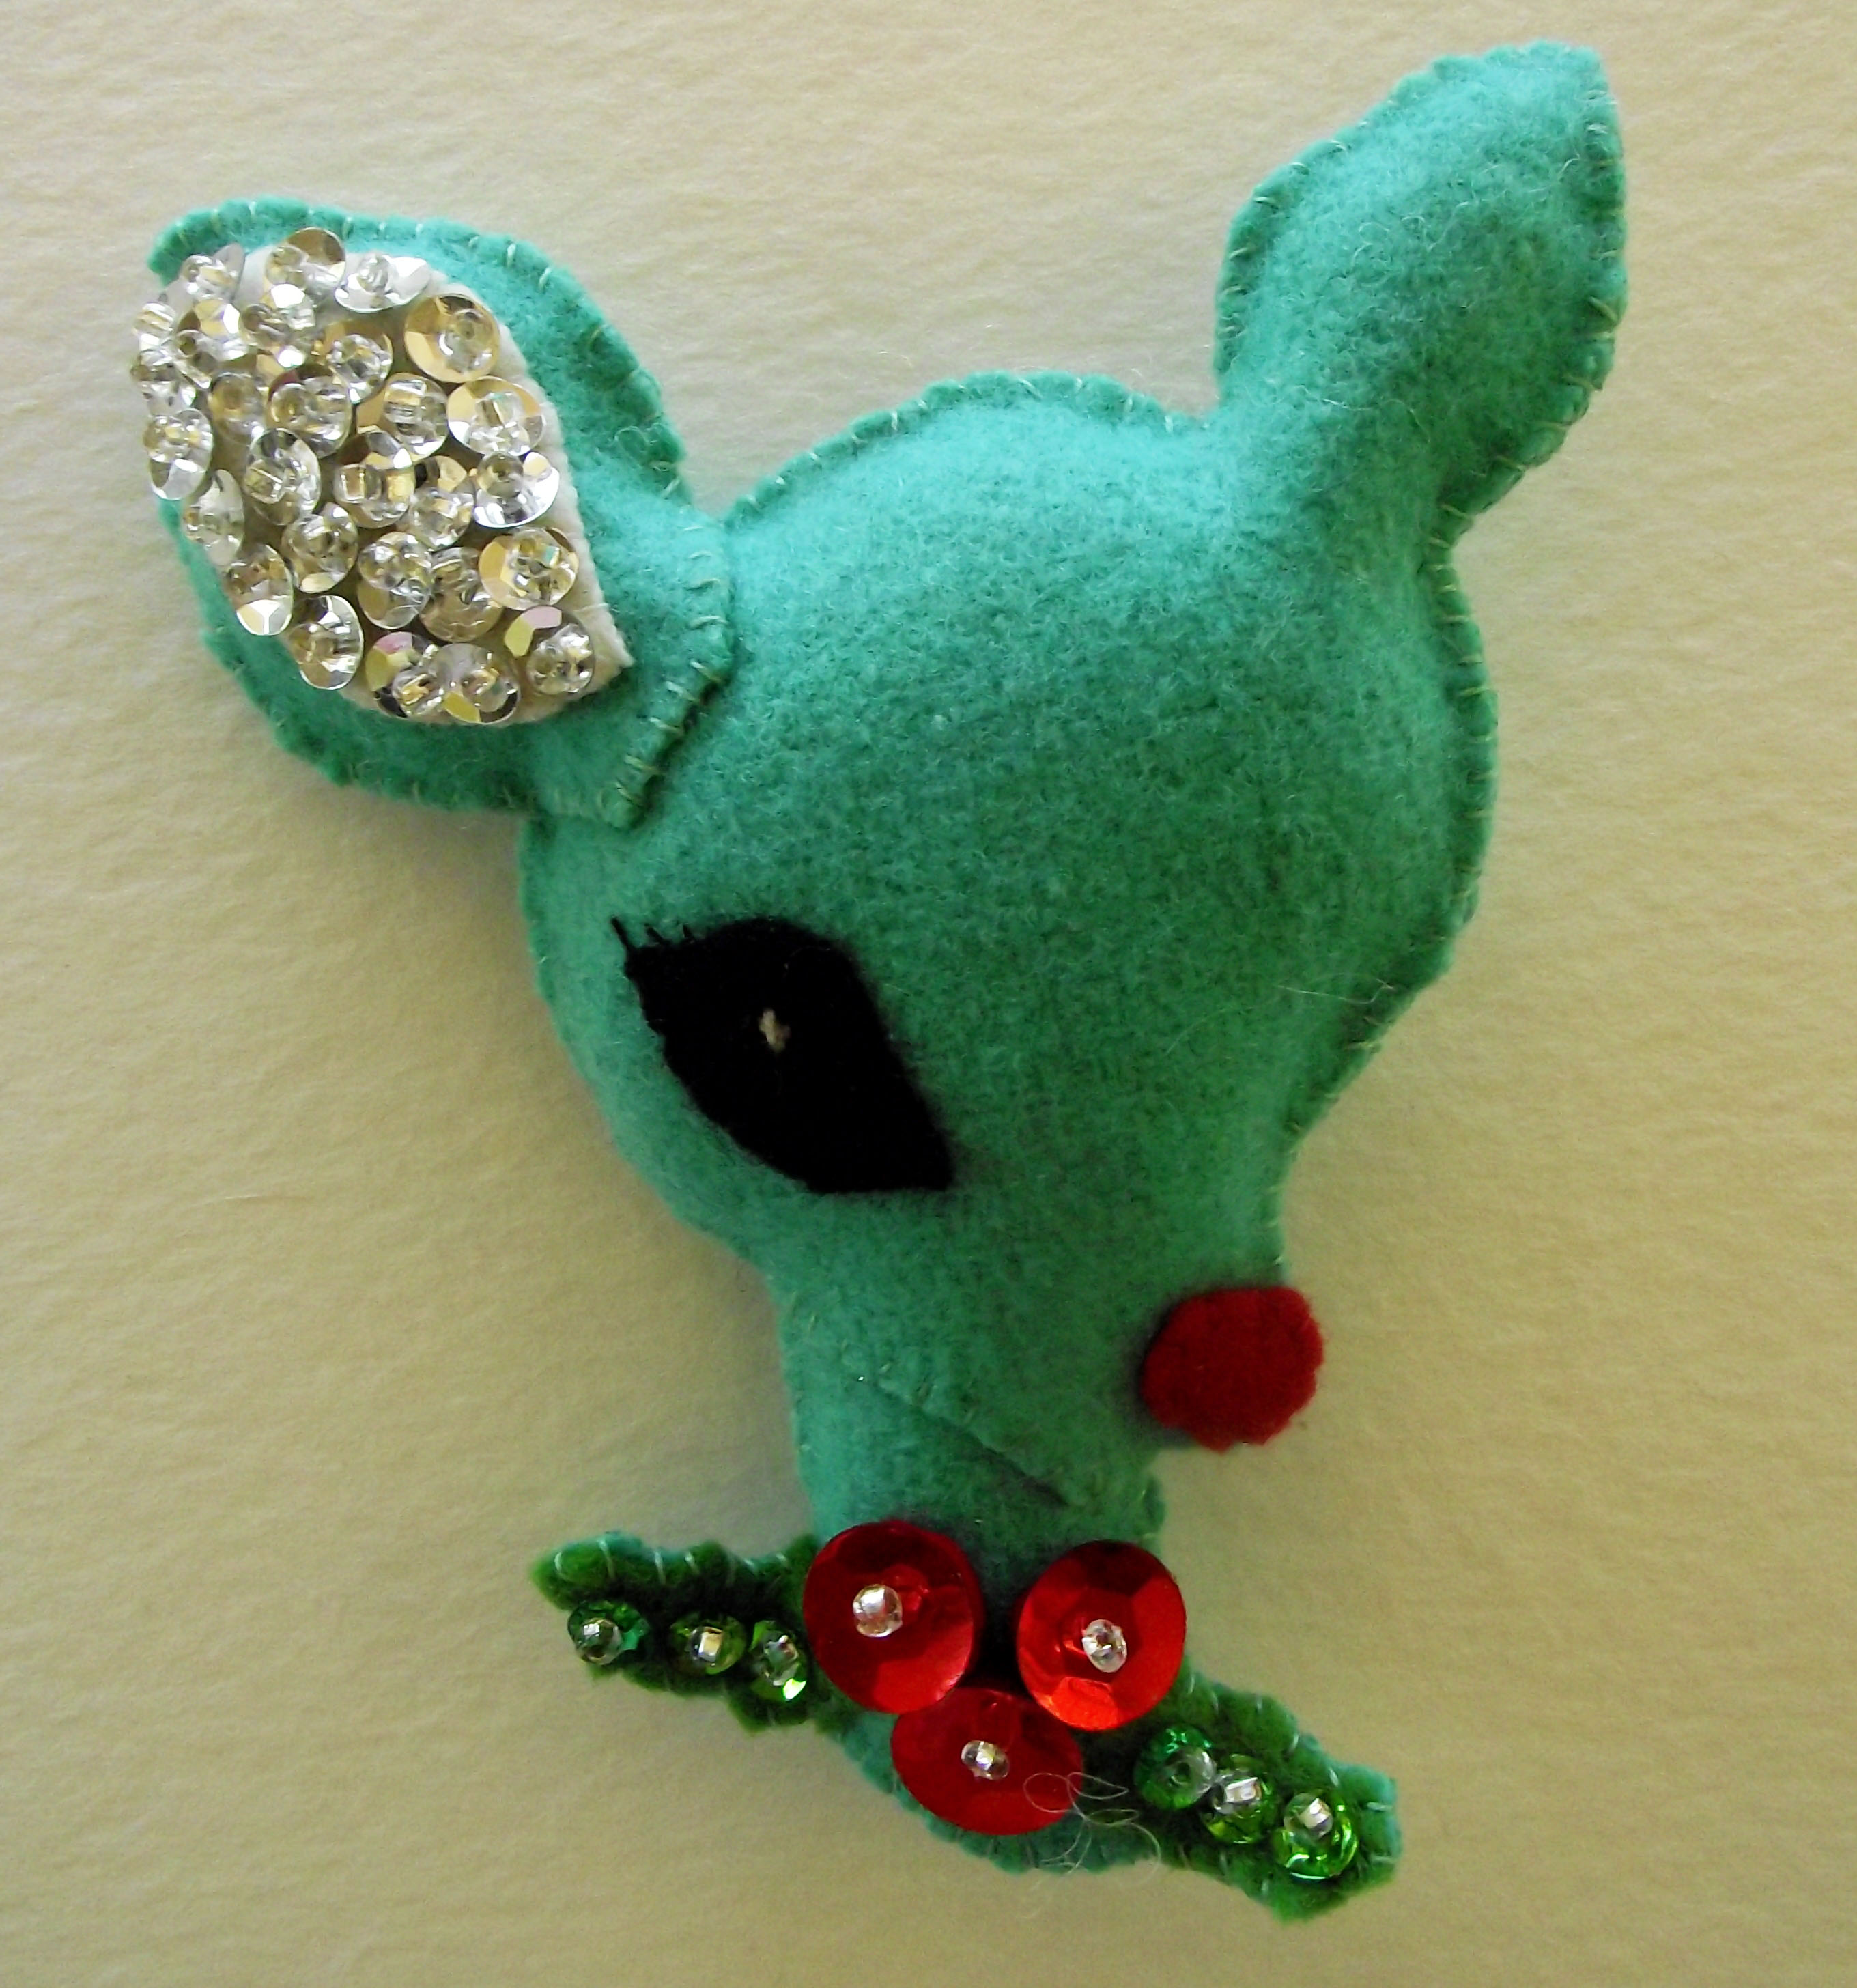 Reindeer christmas ornaments - Sequin Christmas Ornaments Reindeer Ornament 1